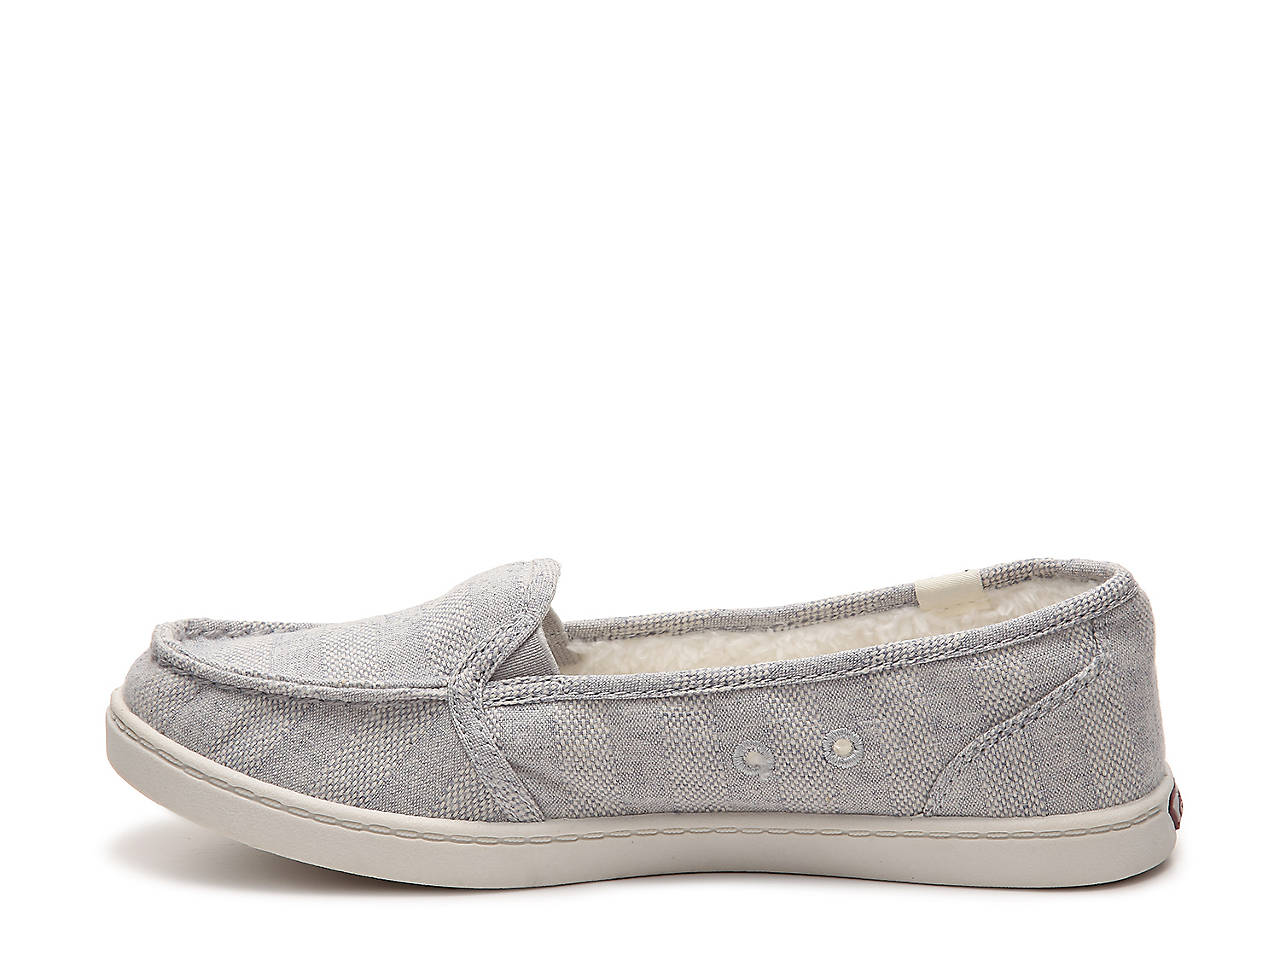 ed699226e50 Roxy Minnow Chambray Sport Flat Men s Shoes